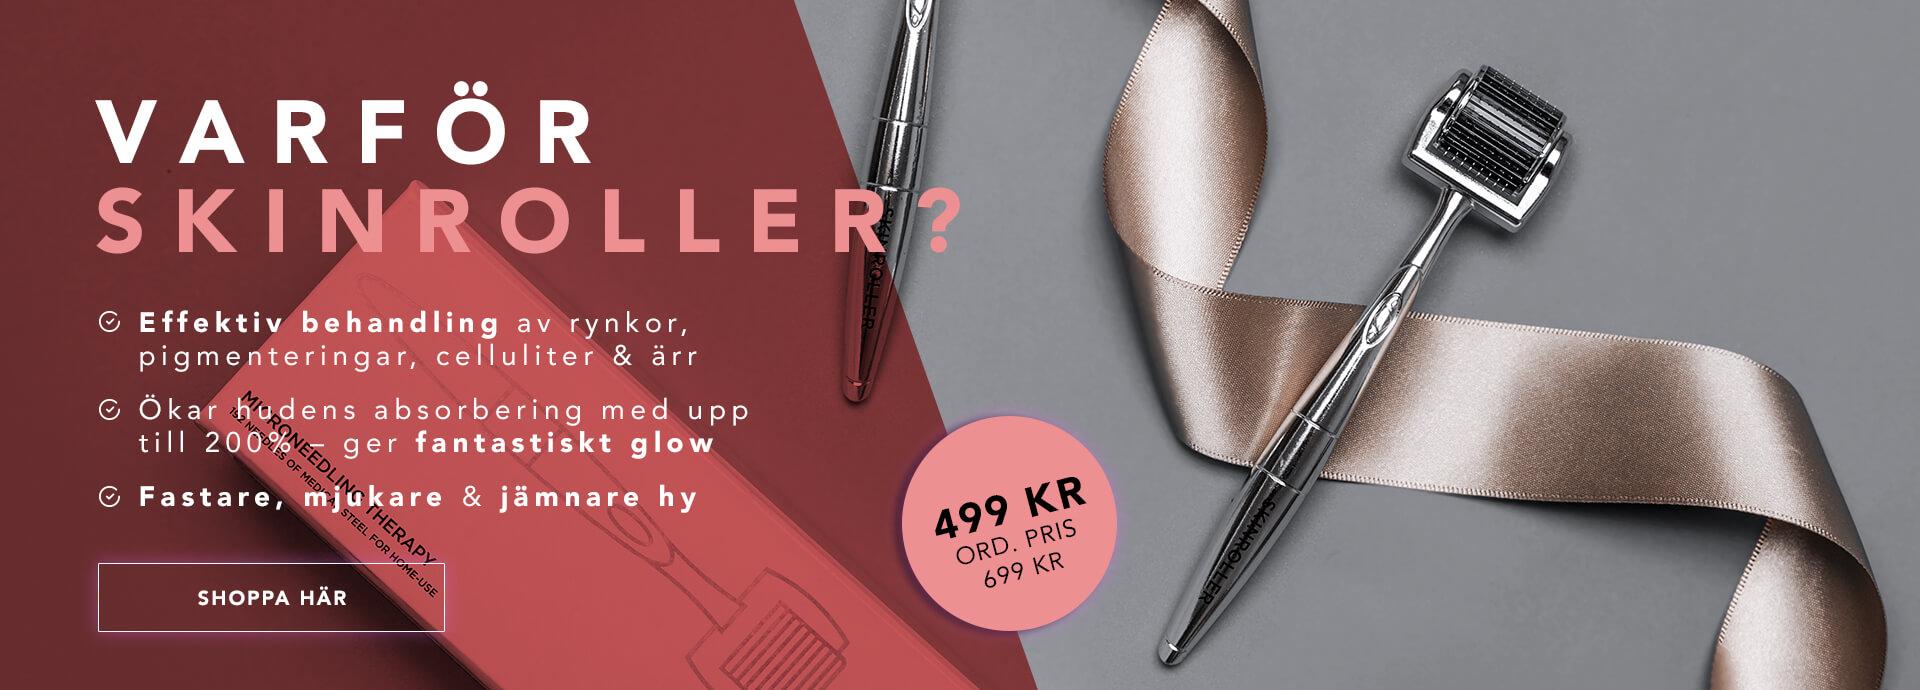 https://www.skinroller.se/image/5204/MELLANDAGSREA_start-DESKTOP-silver-1-.jpg